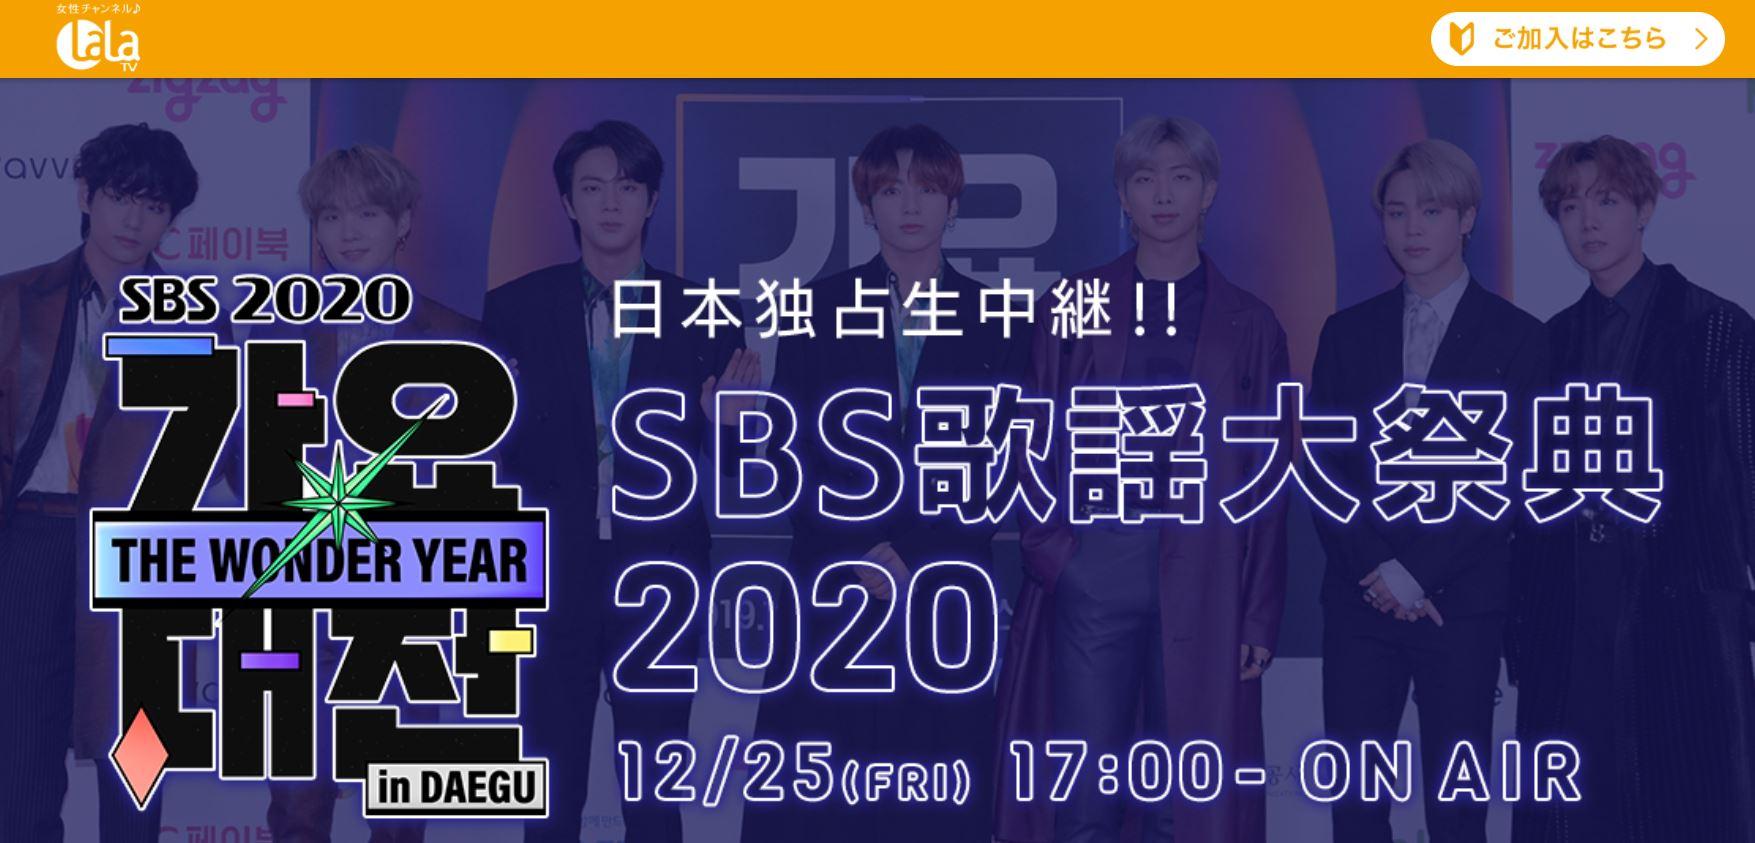 SBS歌謡祭2020のLaLa TV